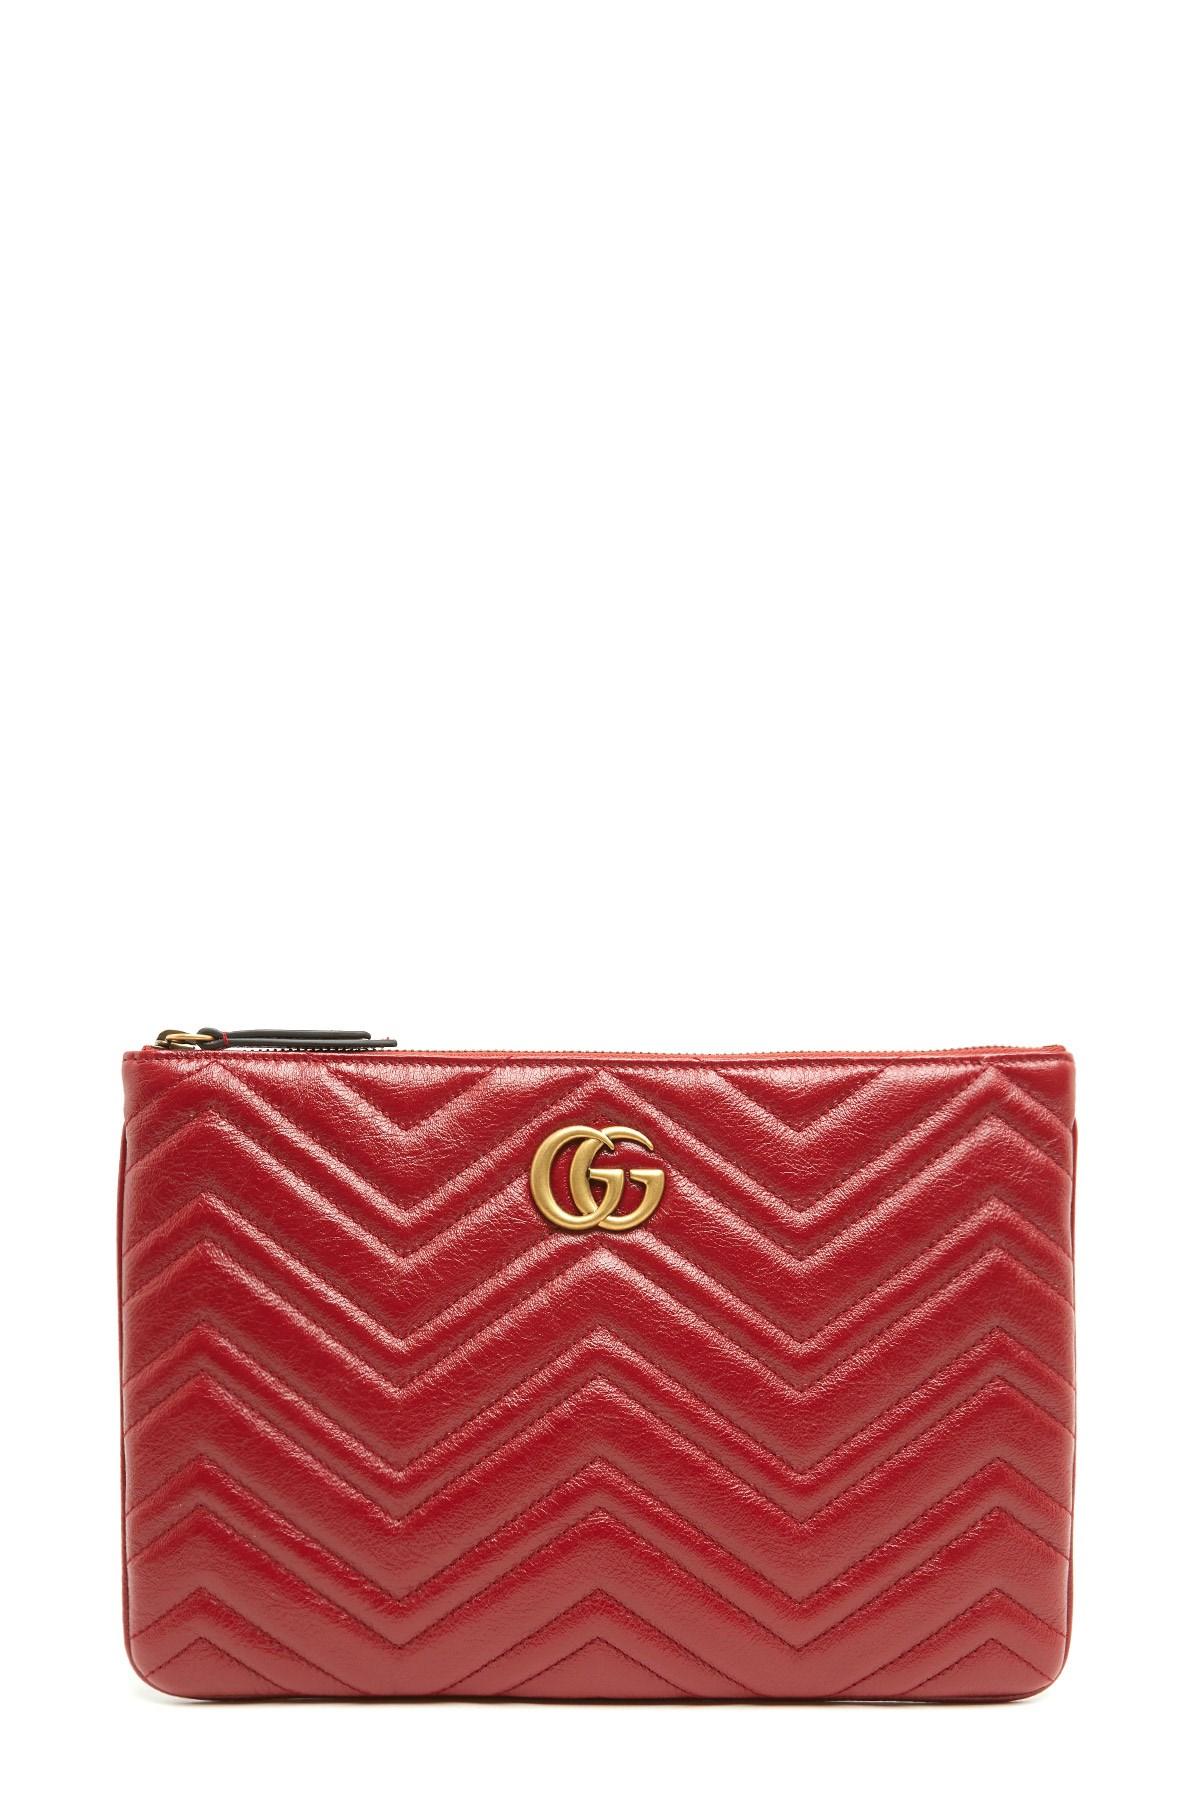 efde7e0b4c8e7f gucci 'GG Marmont 2.0' Clutch available on julian-fashion.com - 67285